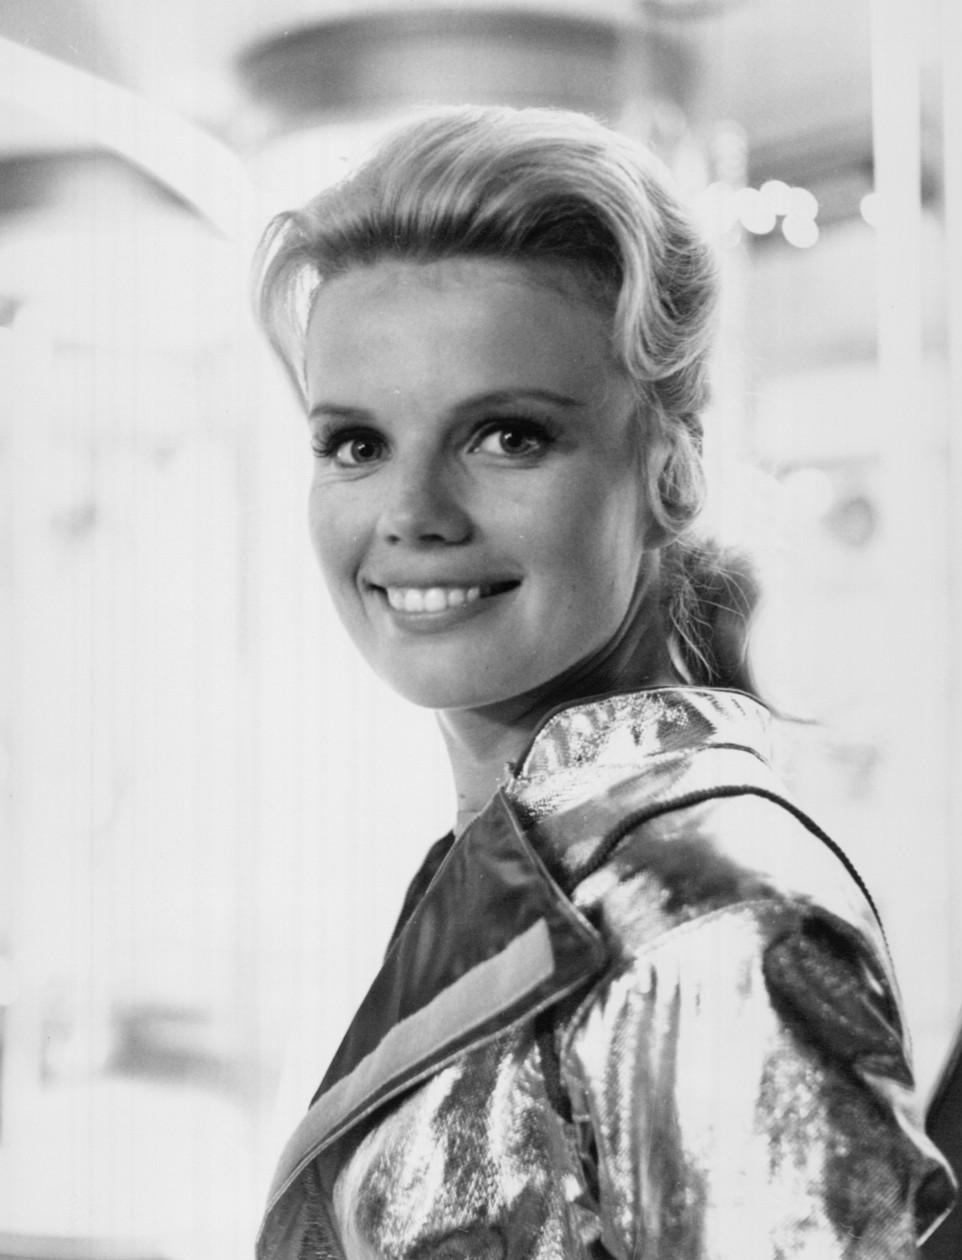 B&W photo of smiling Marta Kristen